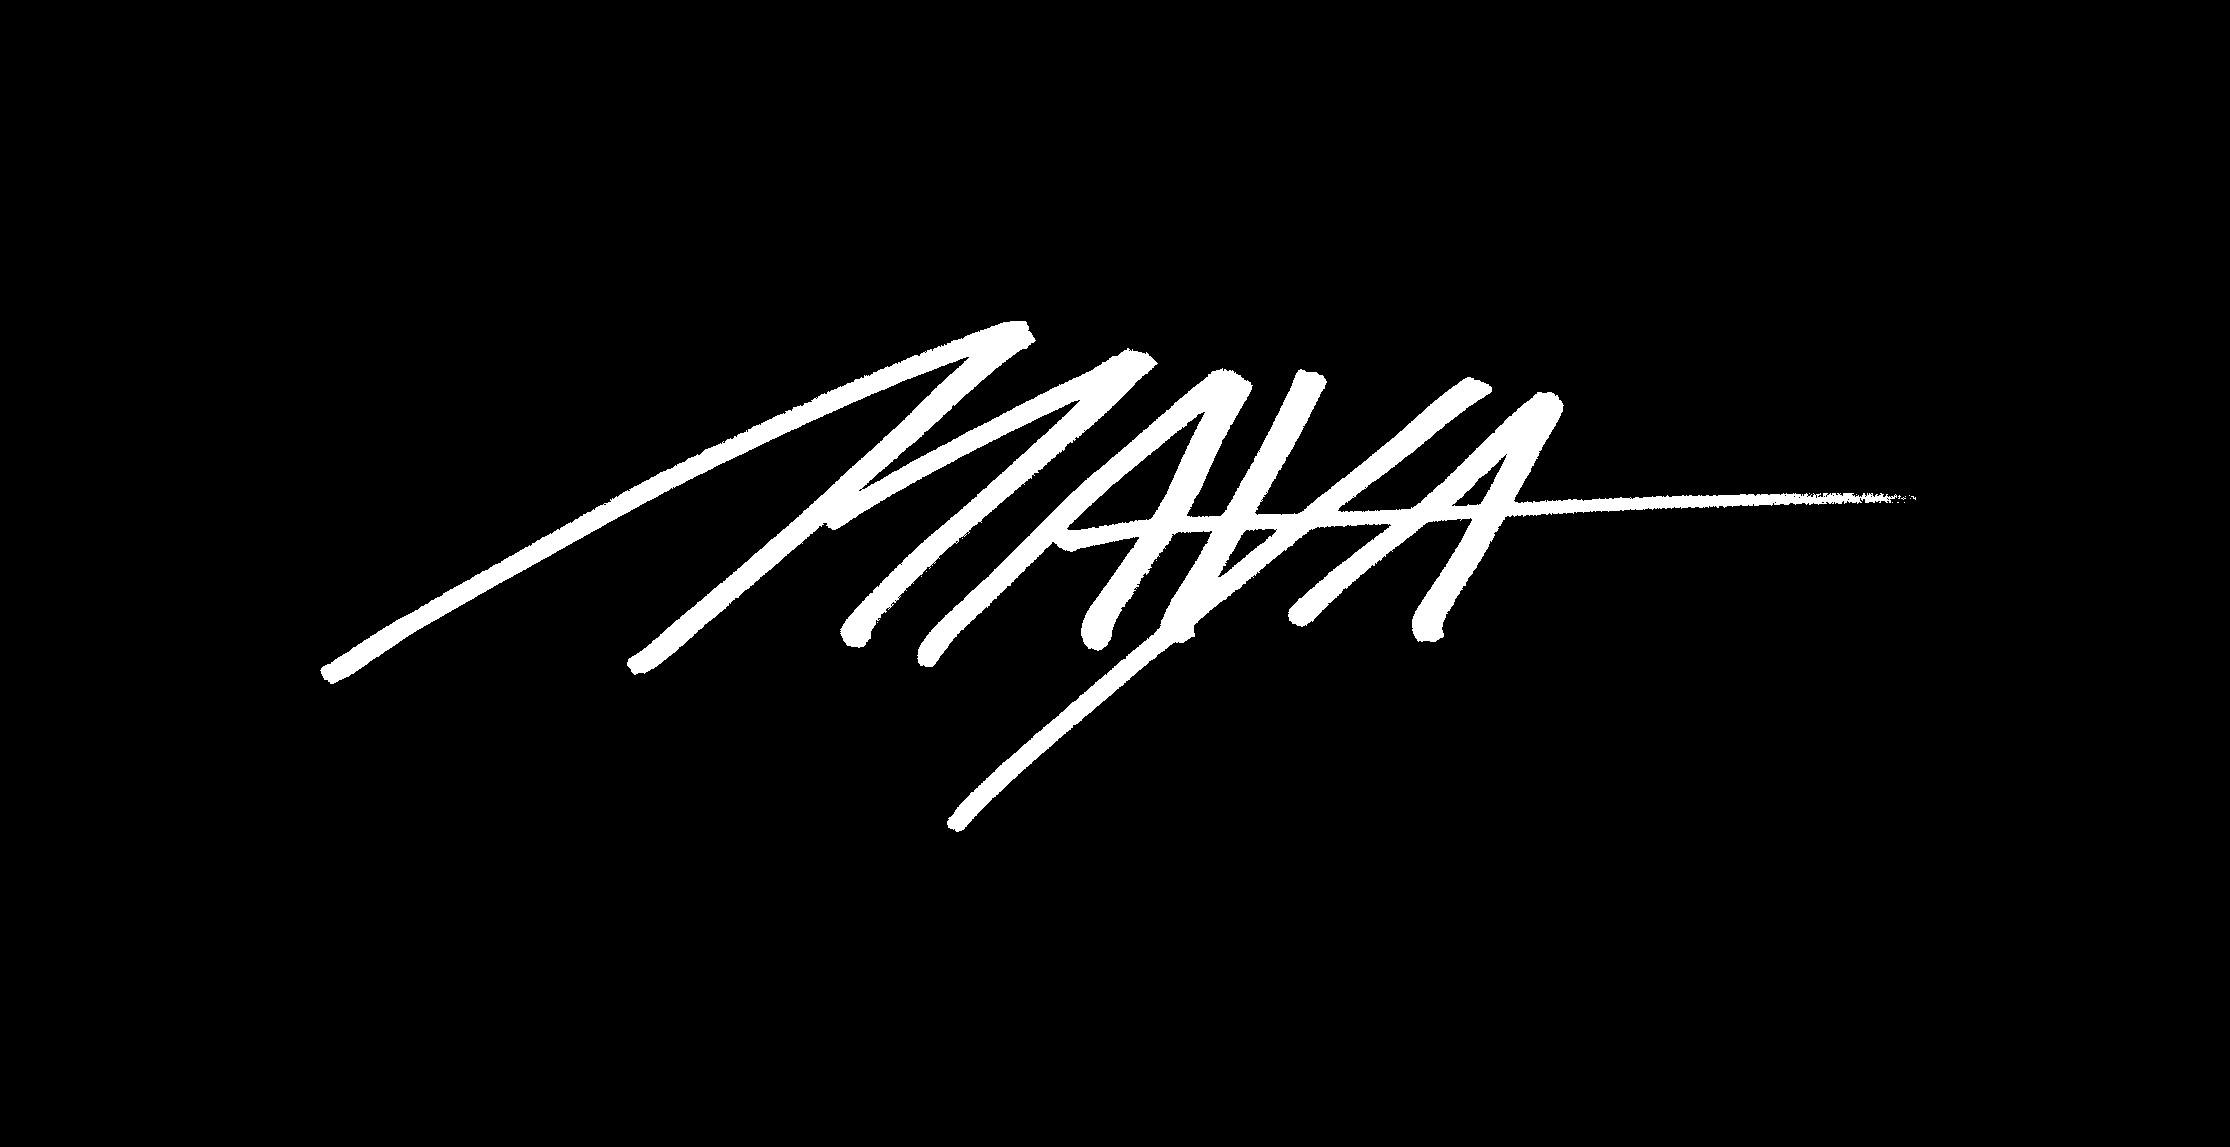 maya henaff's Signature